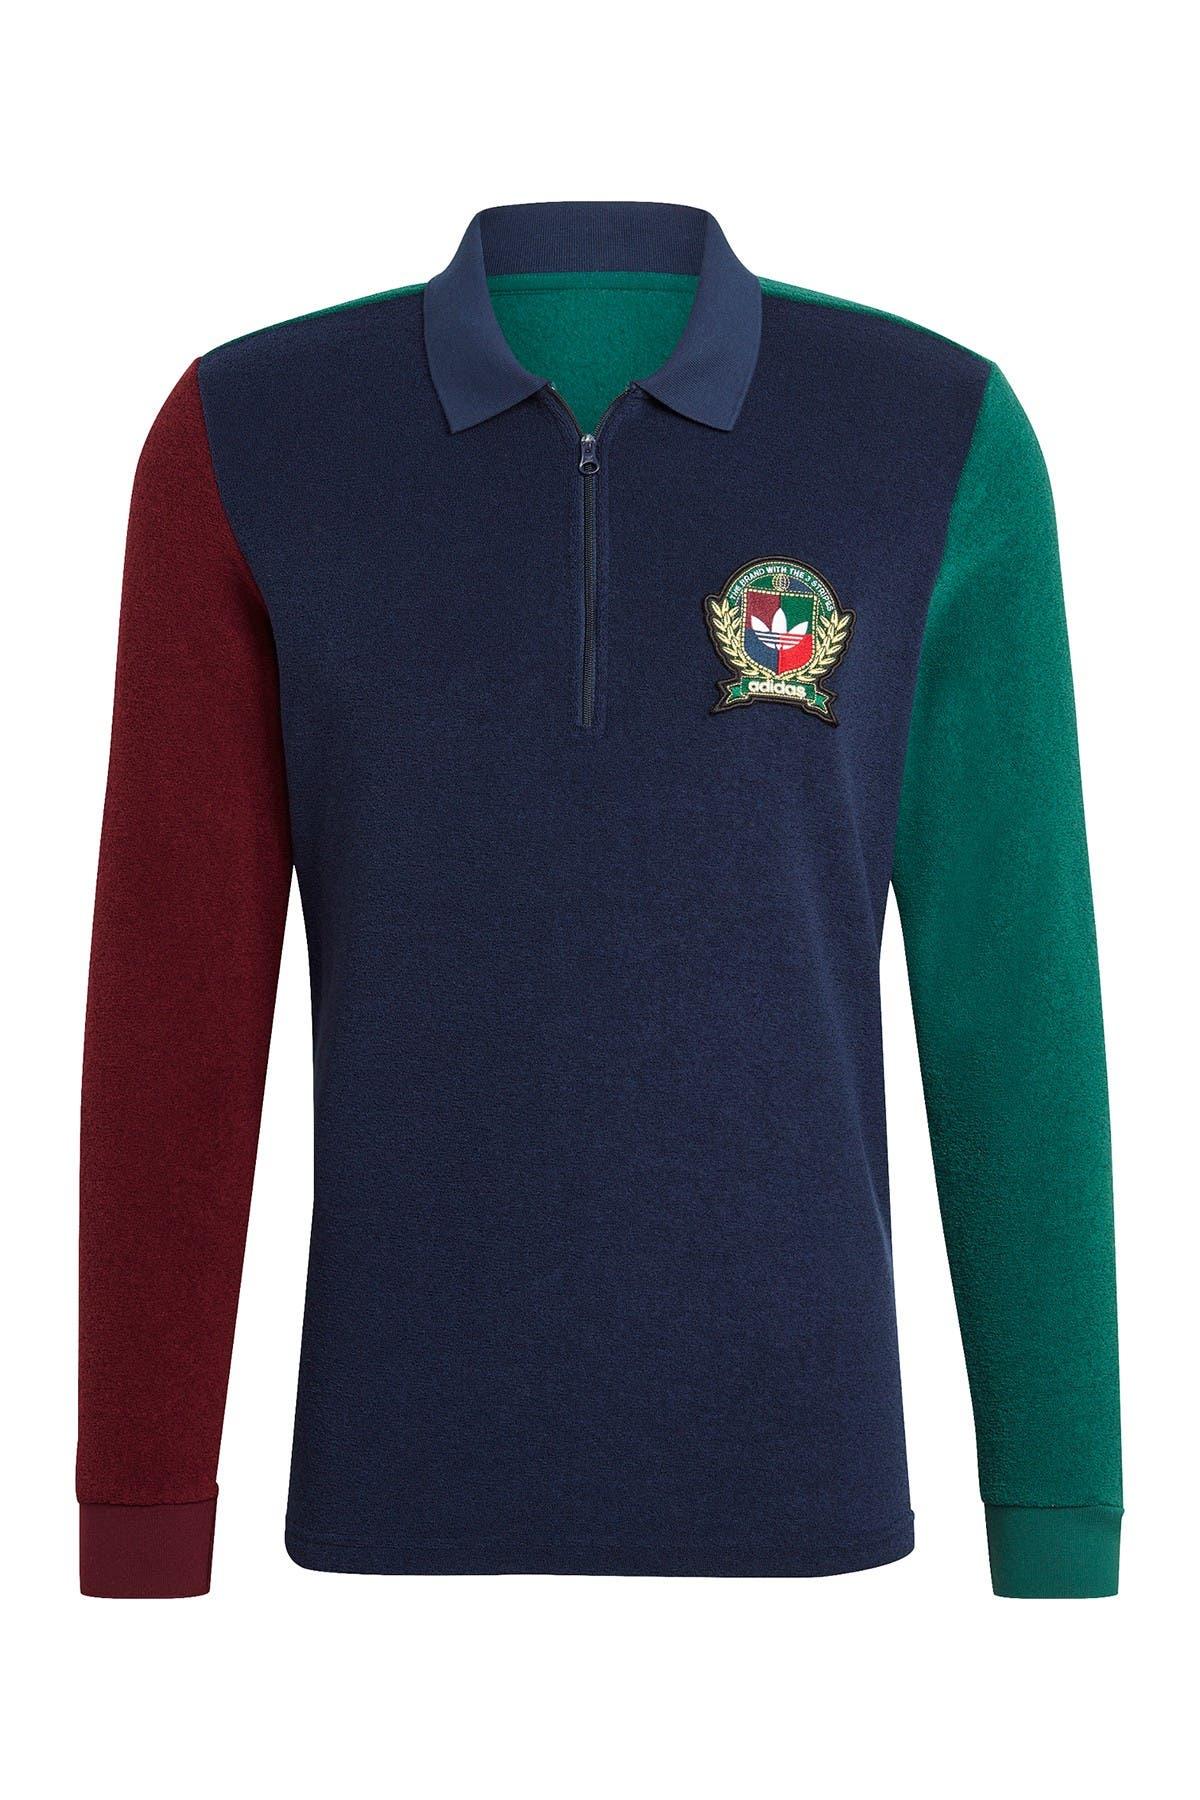 Image of adidas Crest Polo Shirt